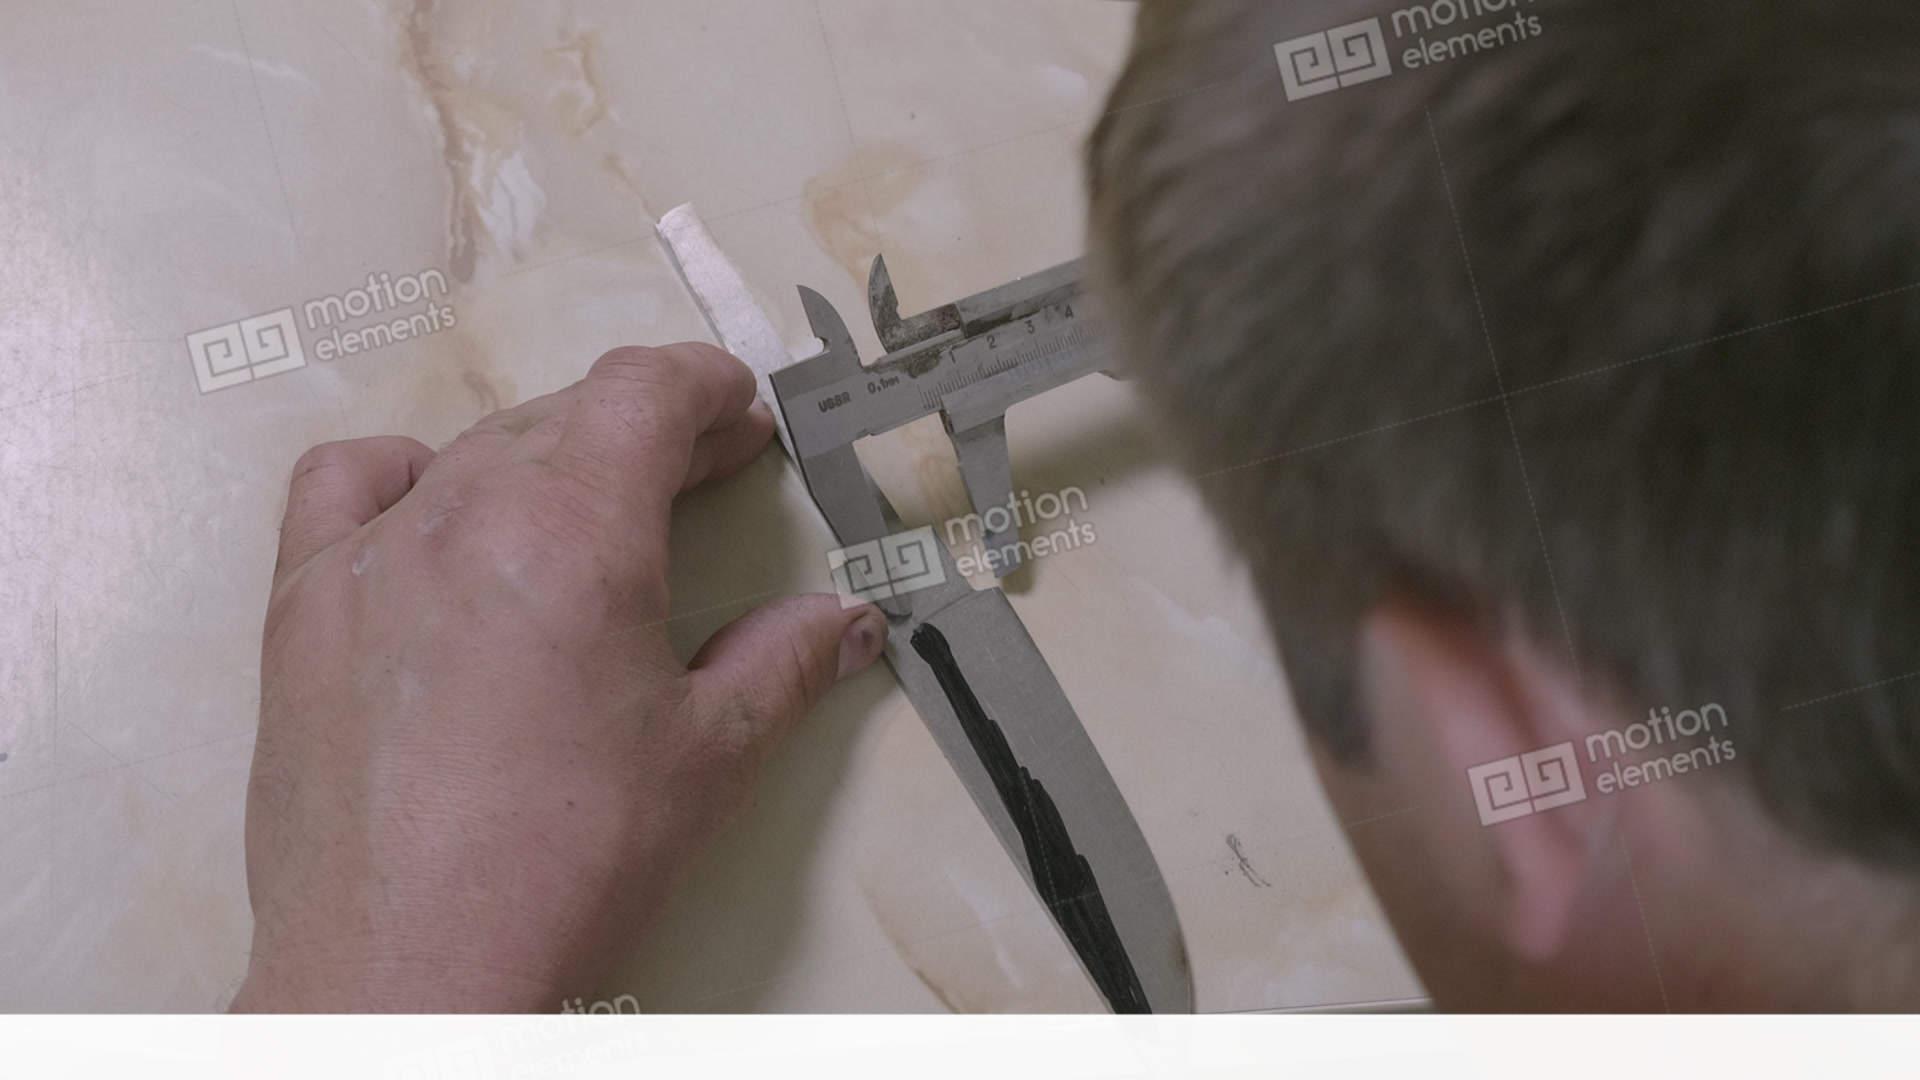 Workman measuring handmade knife diy do it yourself close up of workman measuring handmade knife diy do it yourself stock video footage solutioingenieria Images